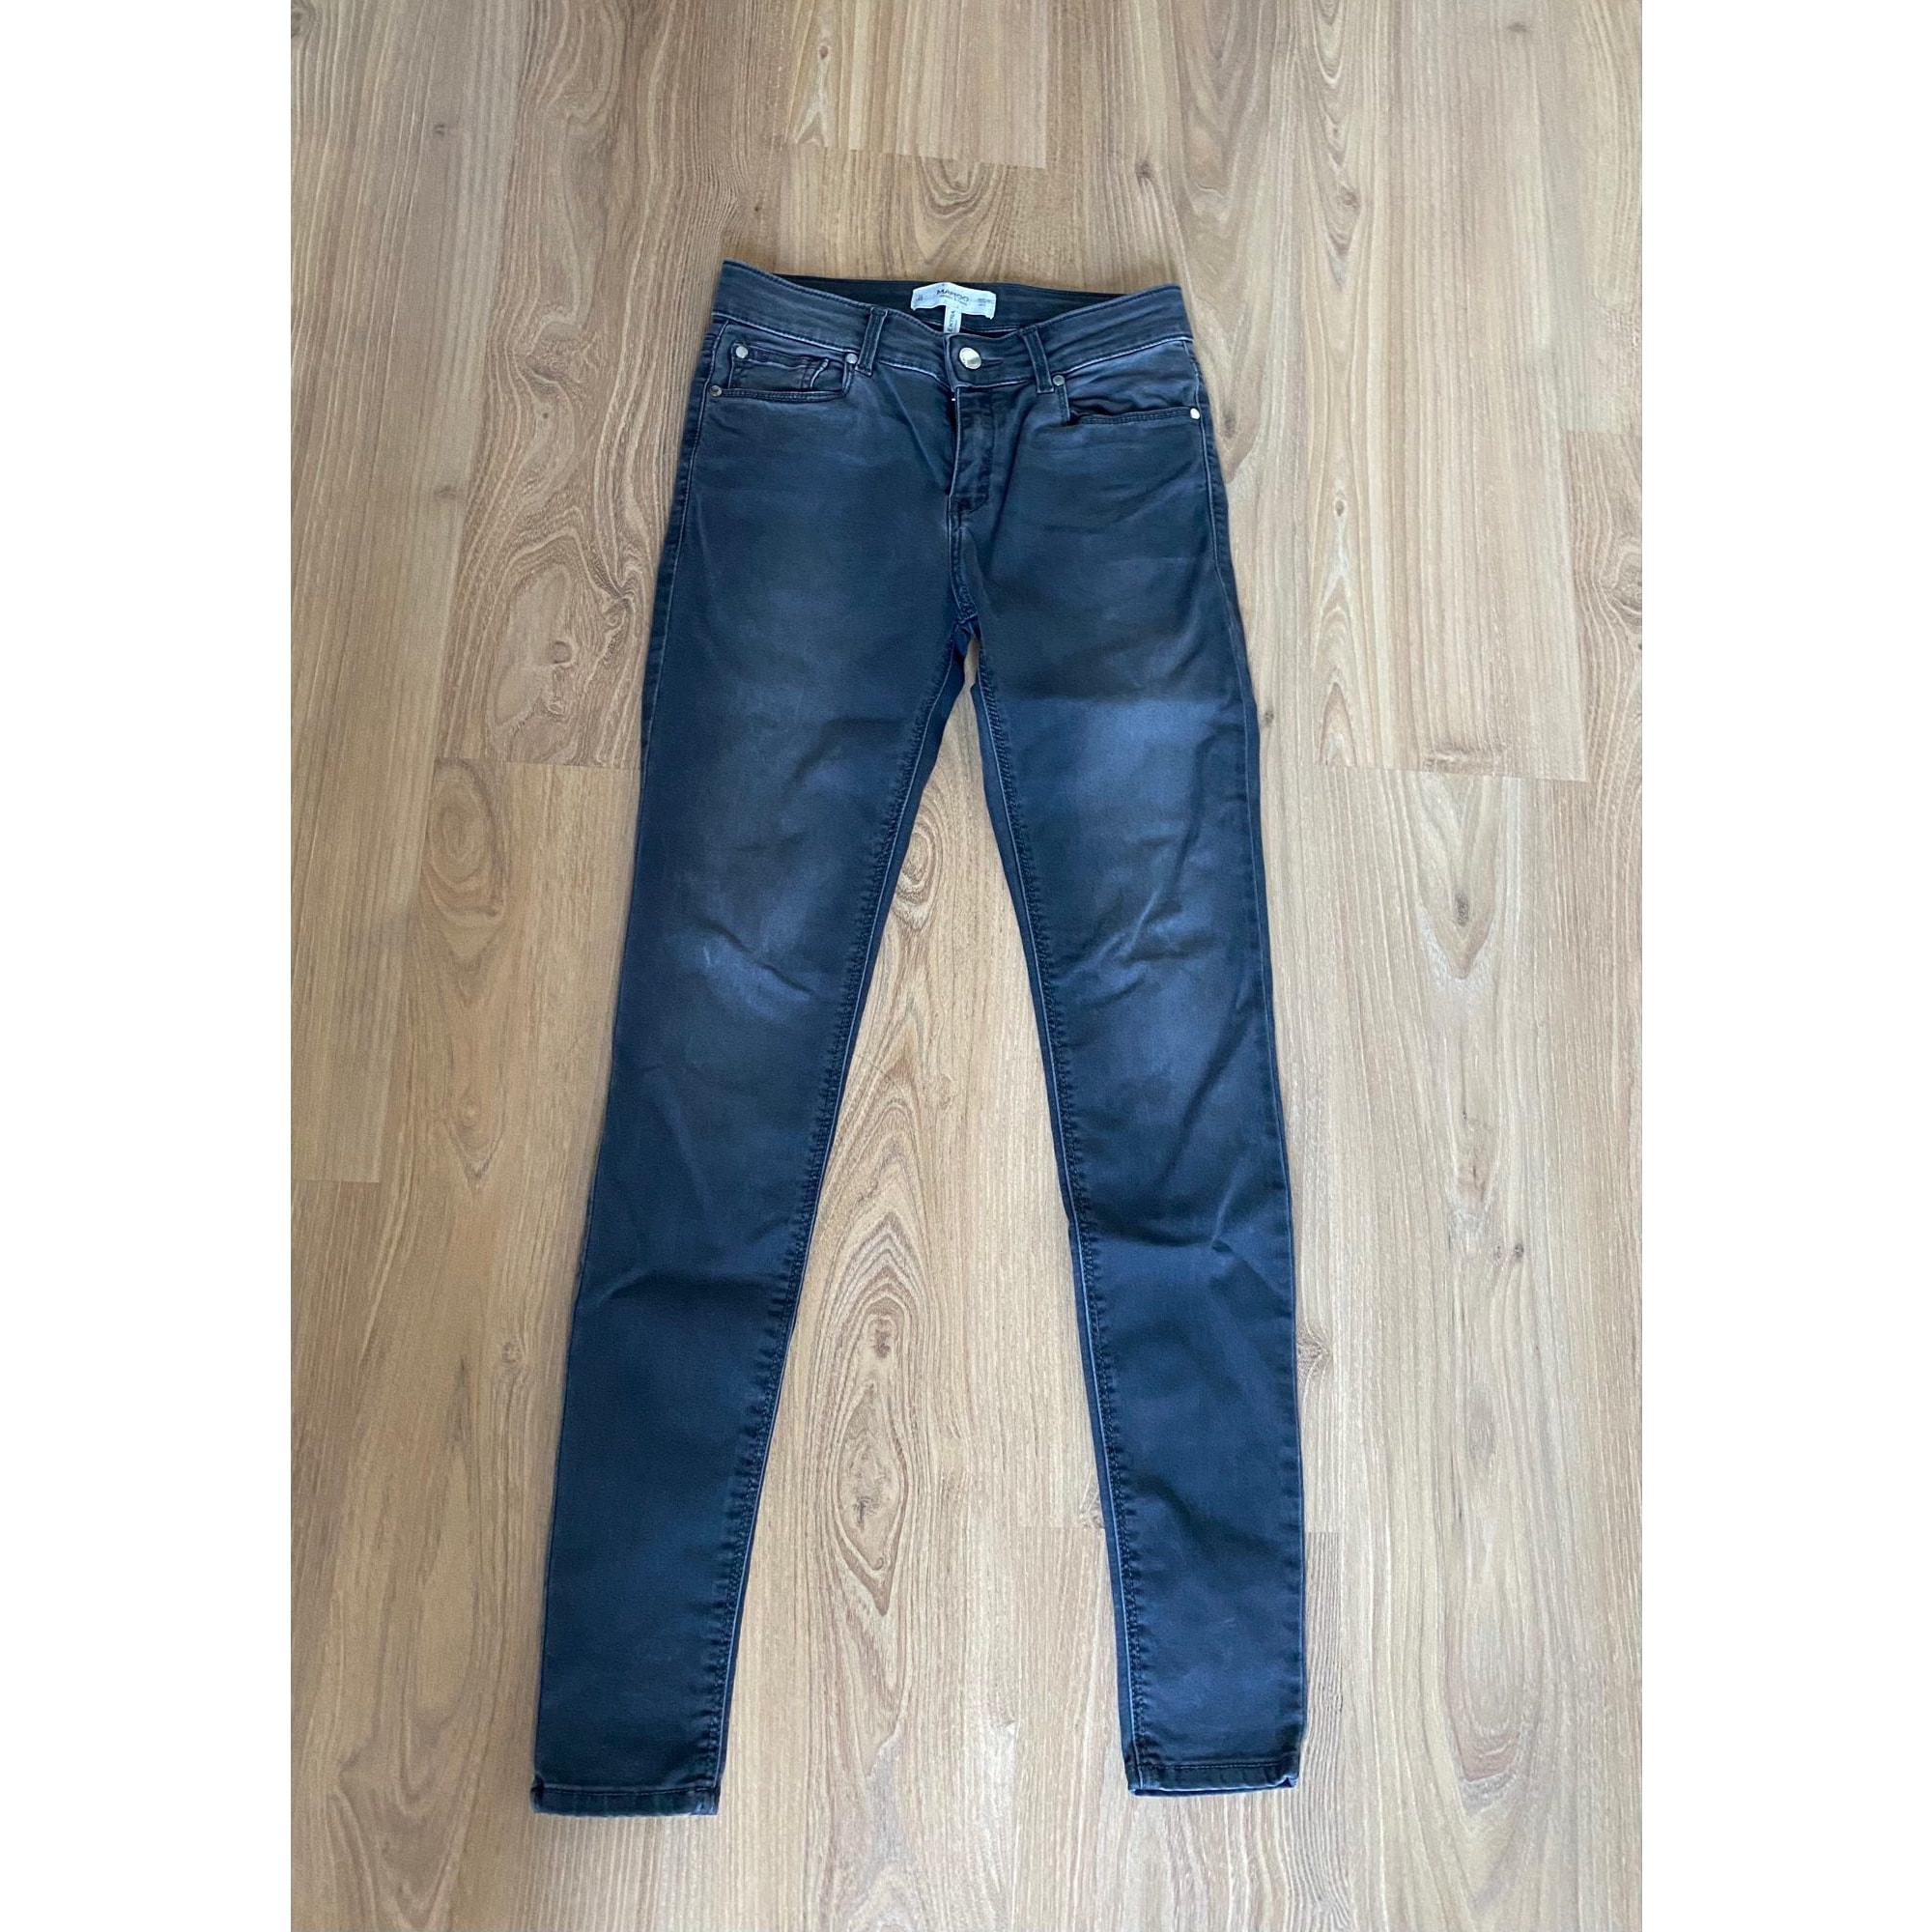 Jeans slim MANGO Gris, anthracite